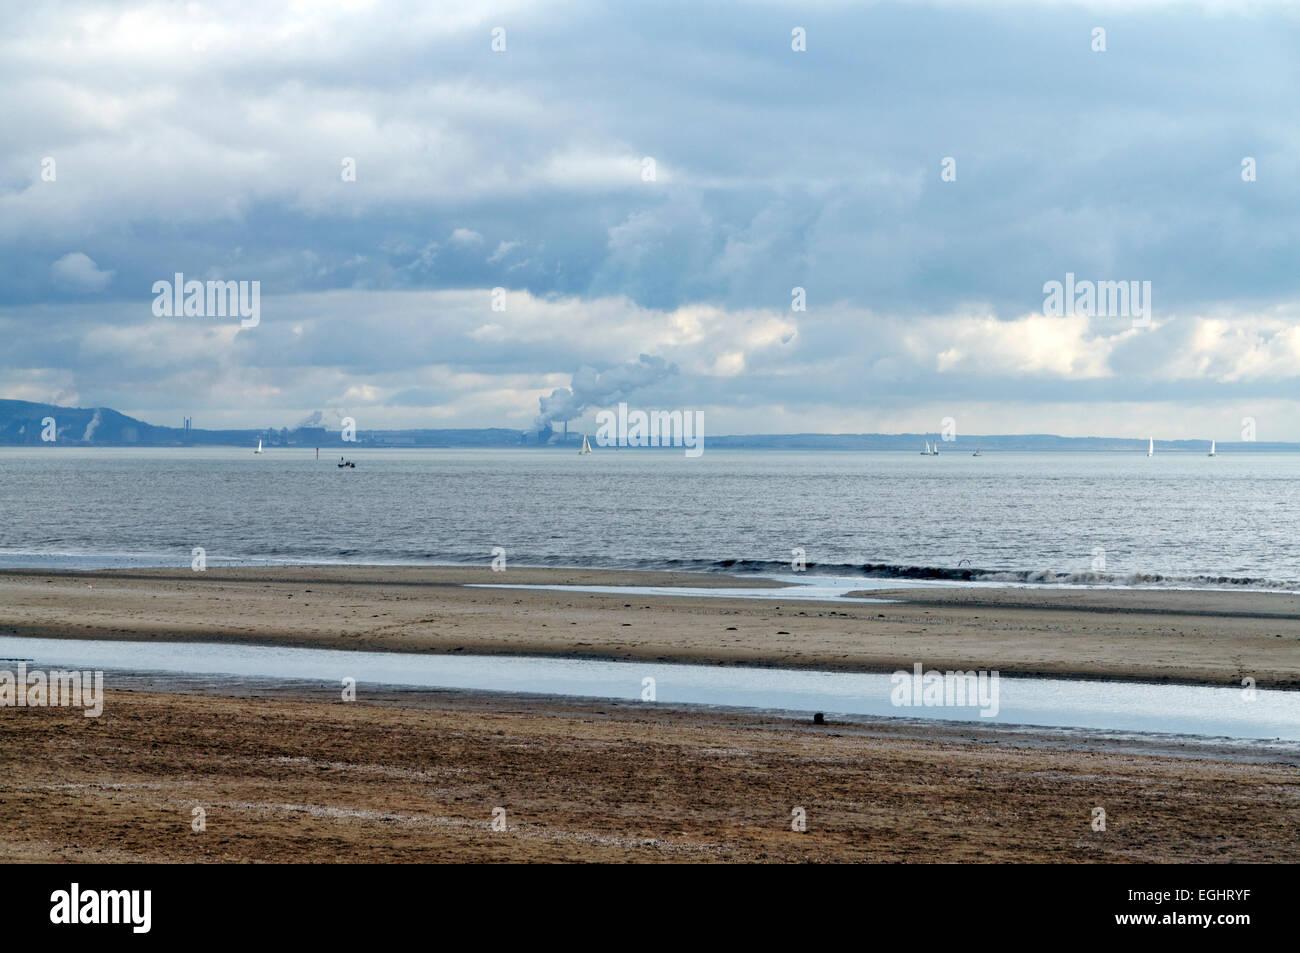 Swansea Bay mit Blick auf Port Talbot Steel Works, Wales, UK. Stockfoto